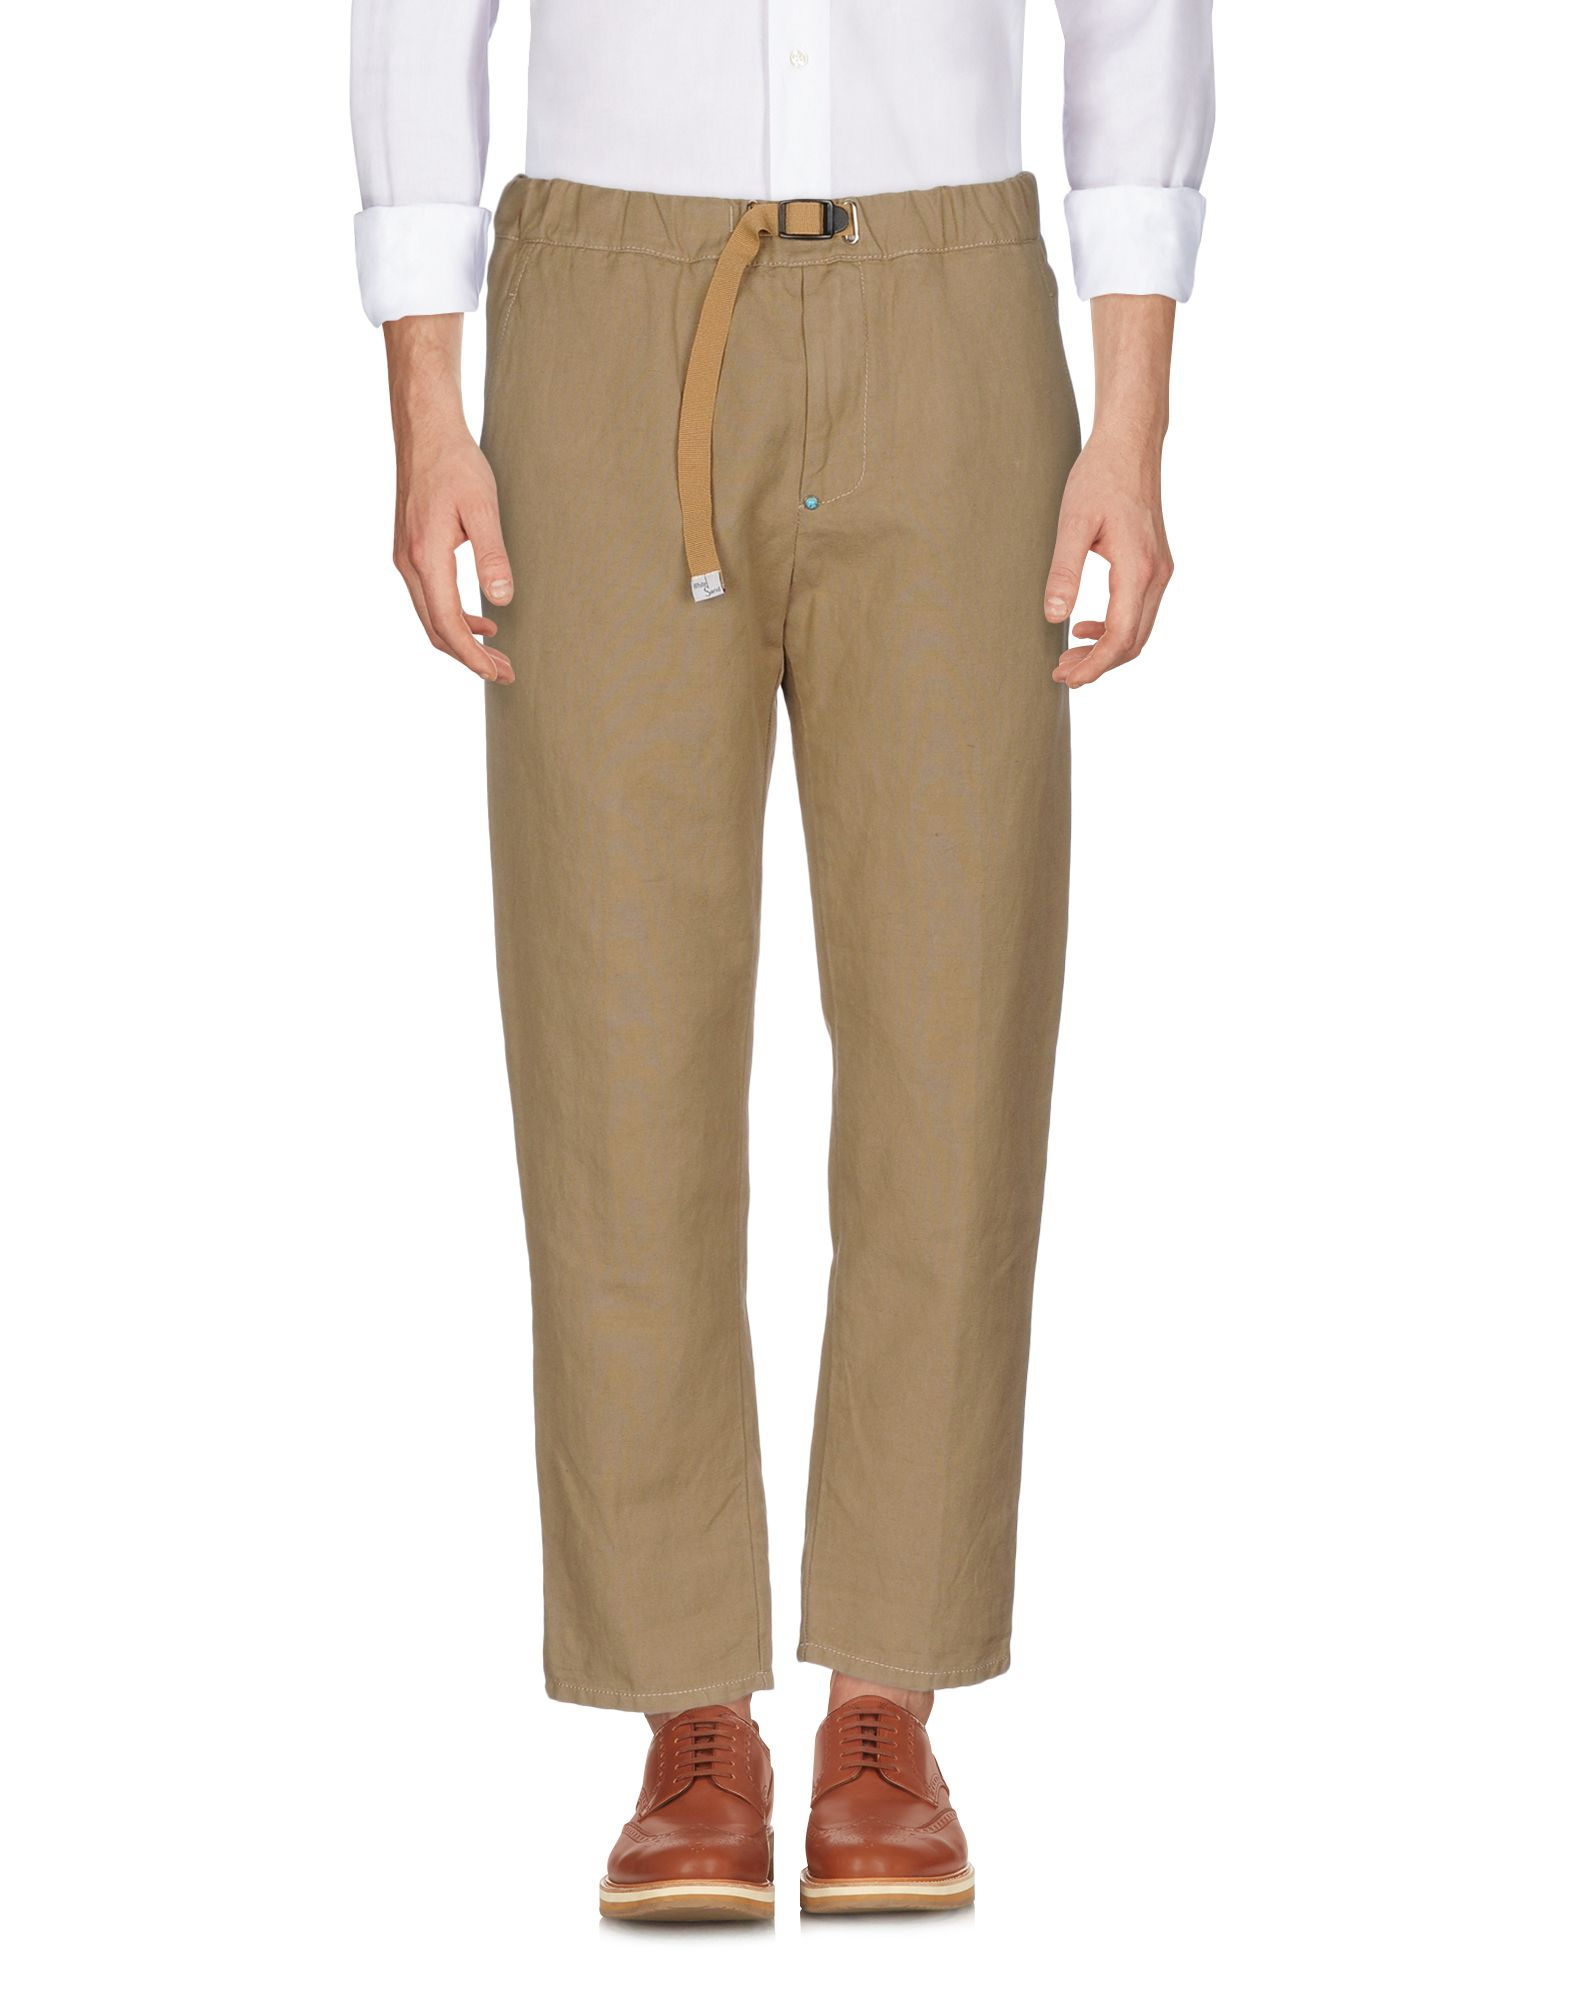 WHITE SAND 88 Повседневные брюки